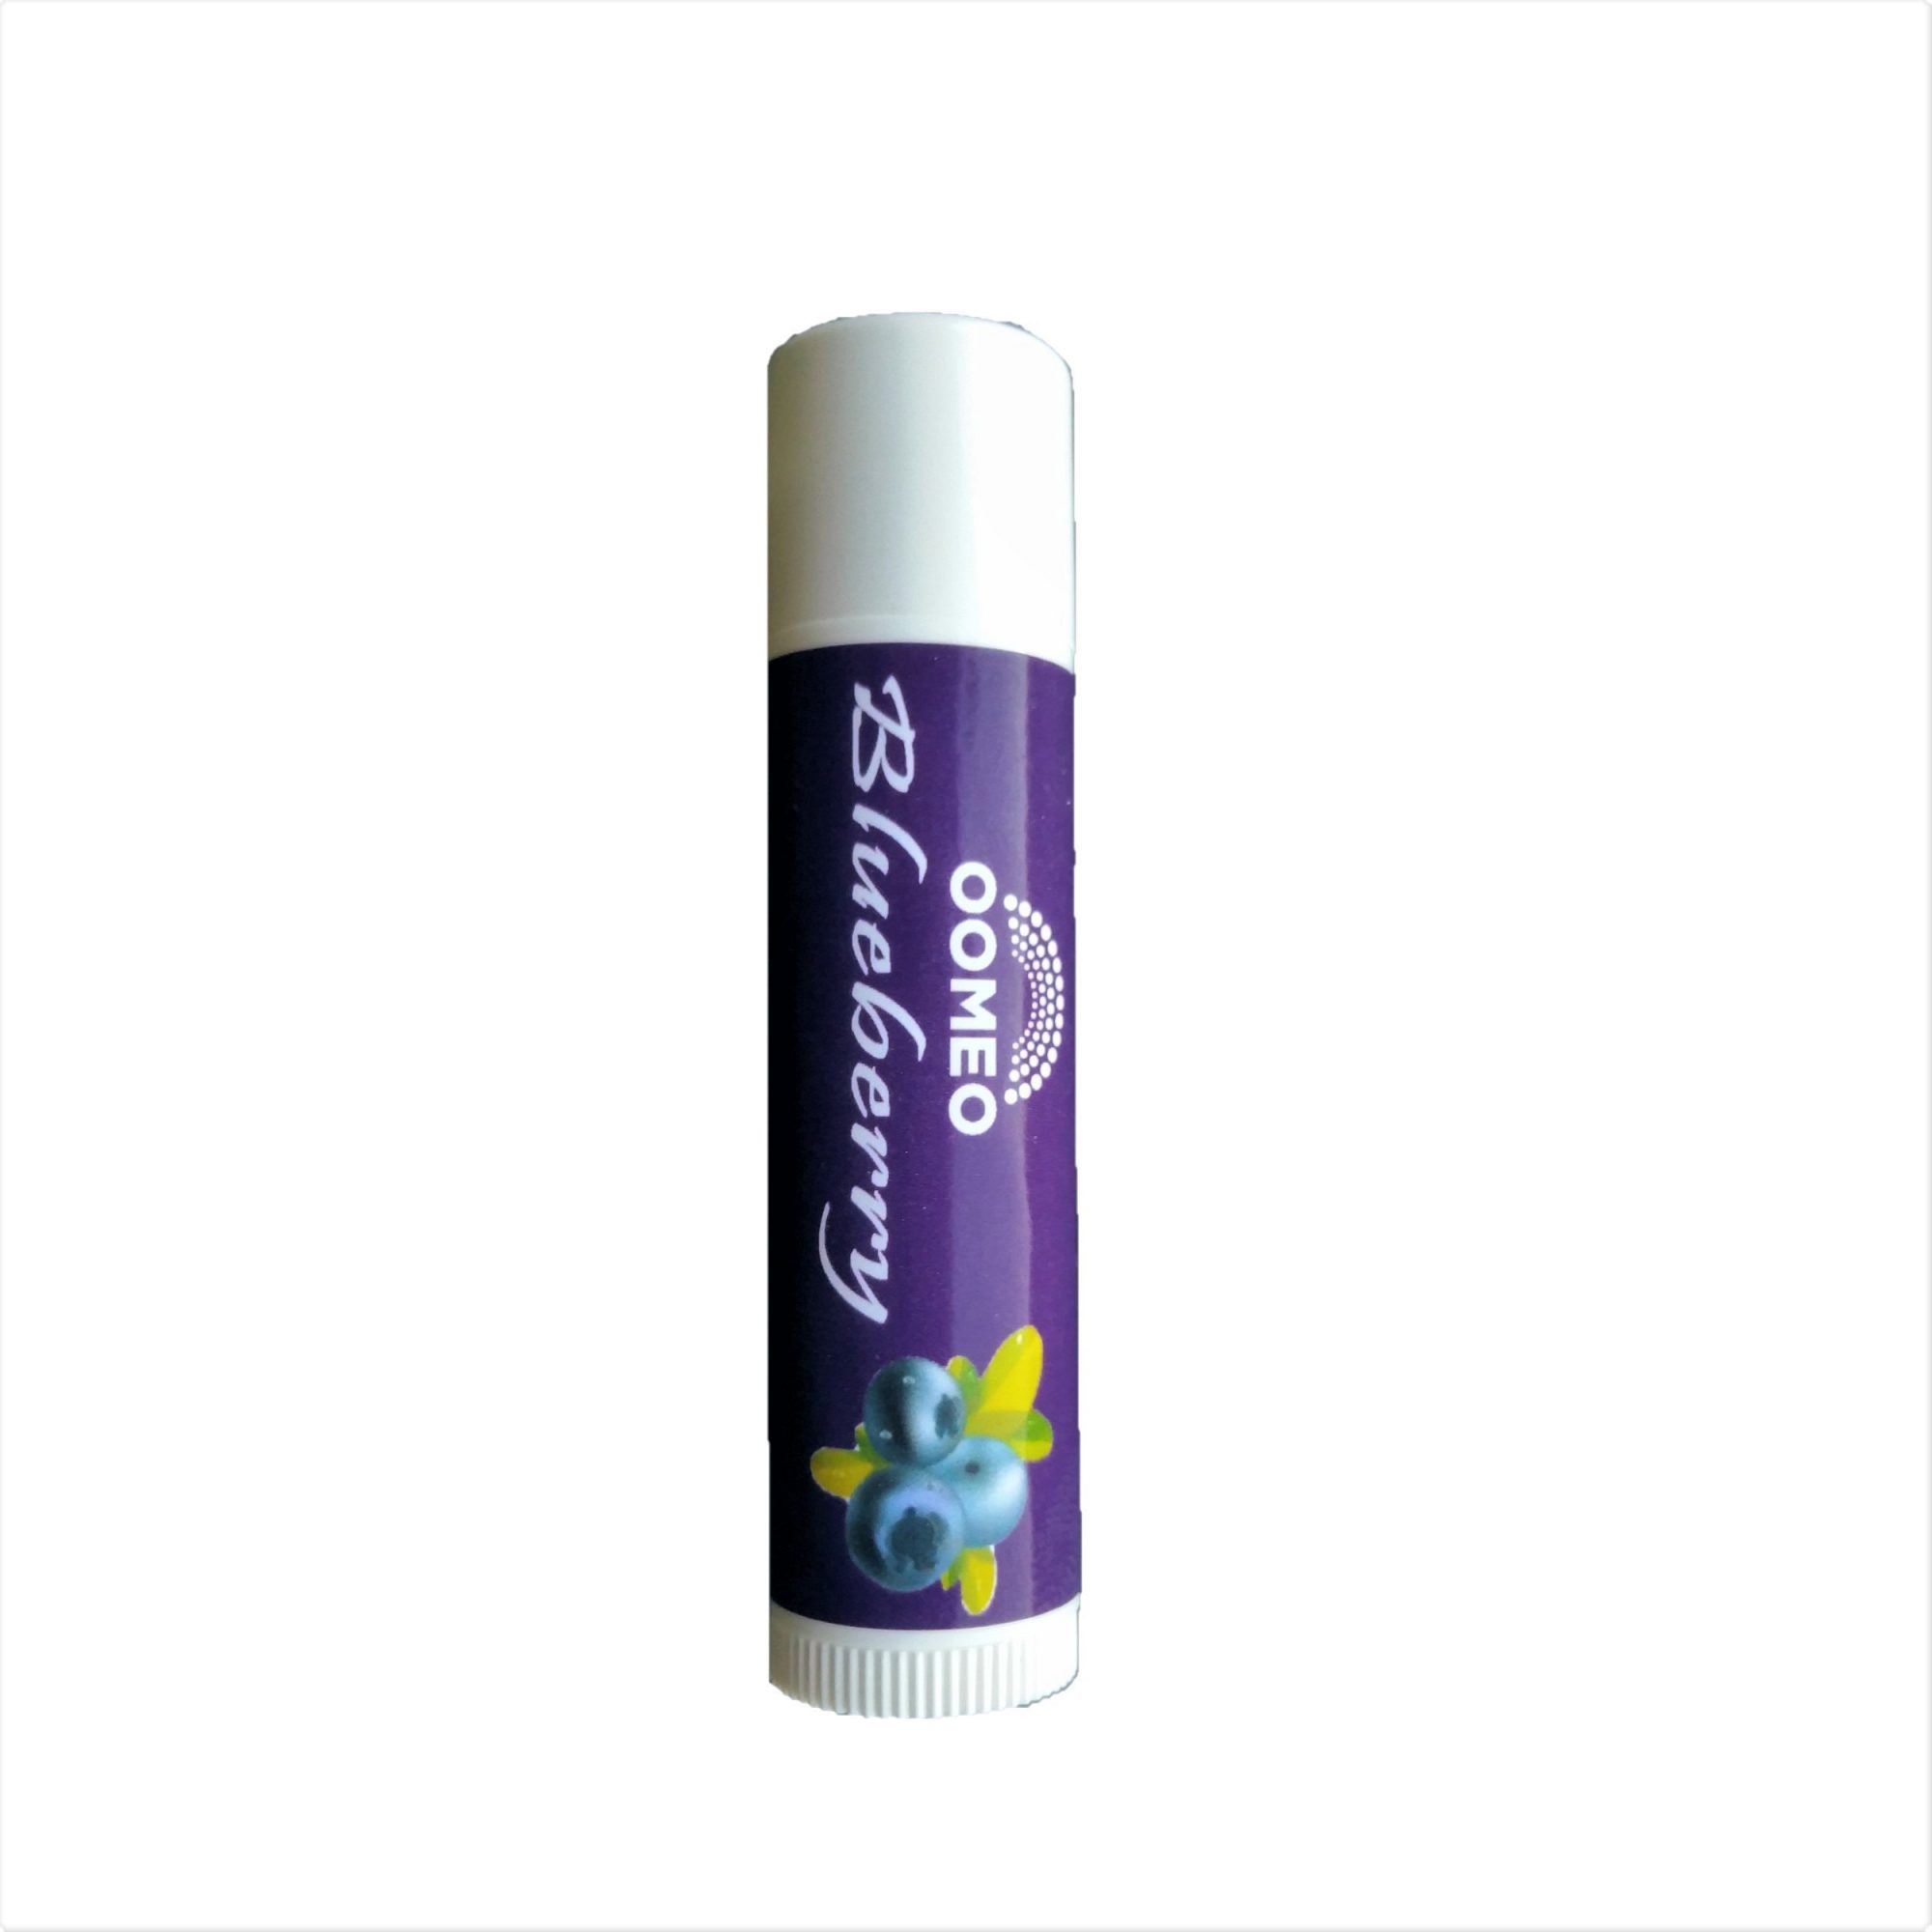 Blueberry lip balm